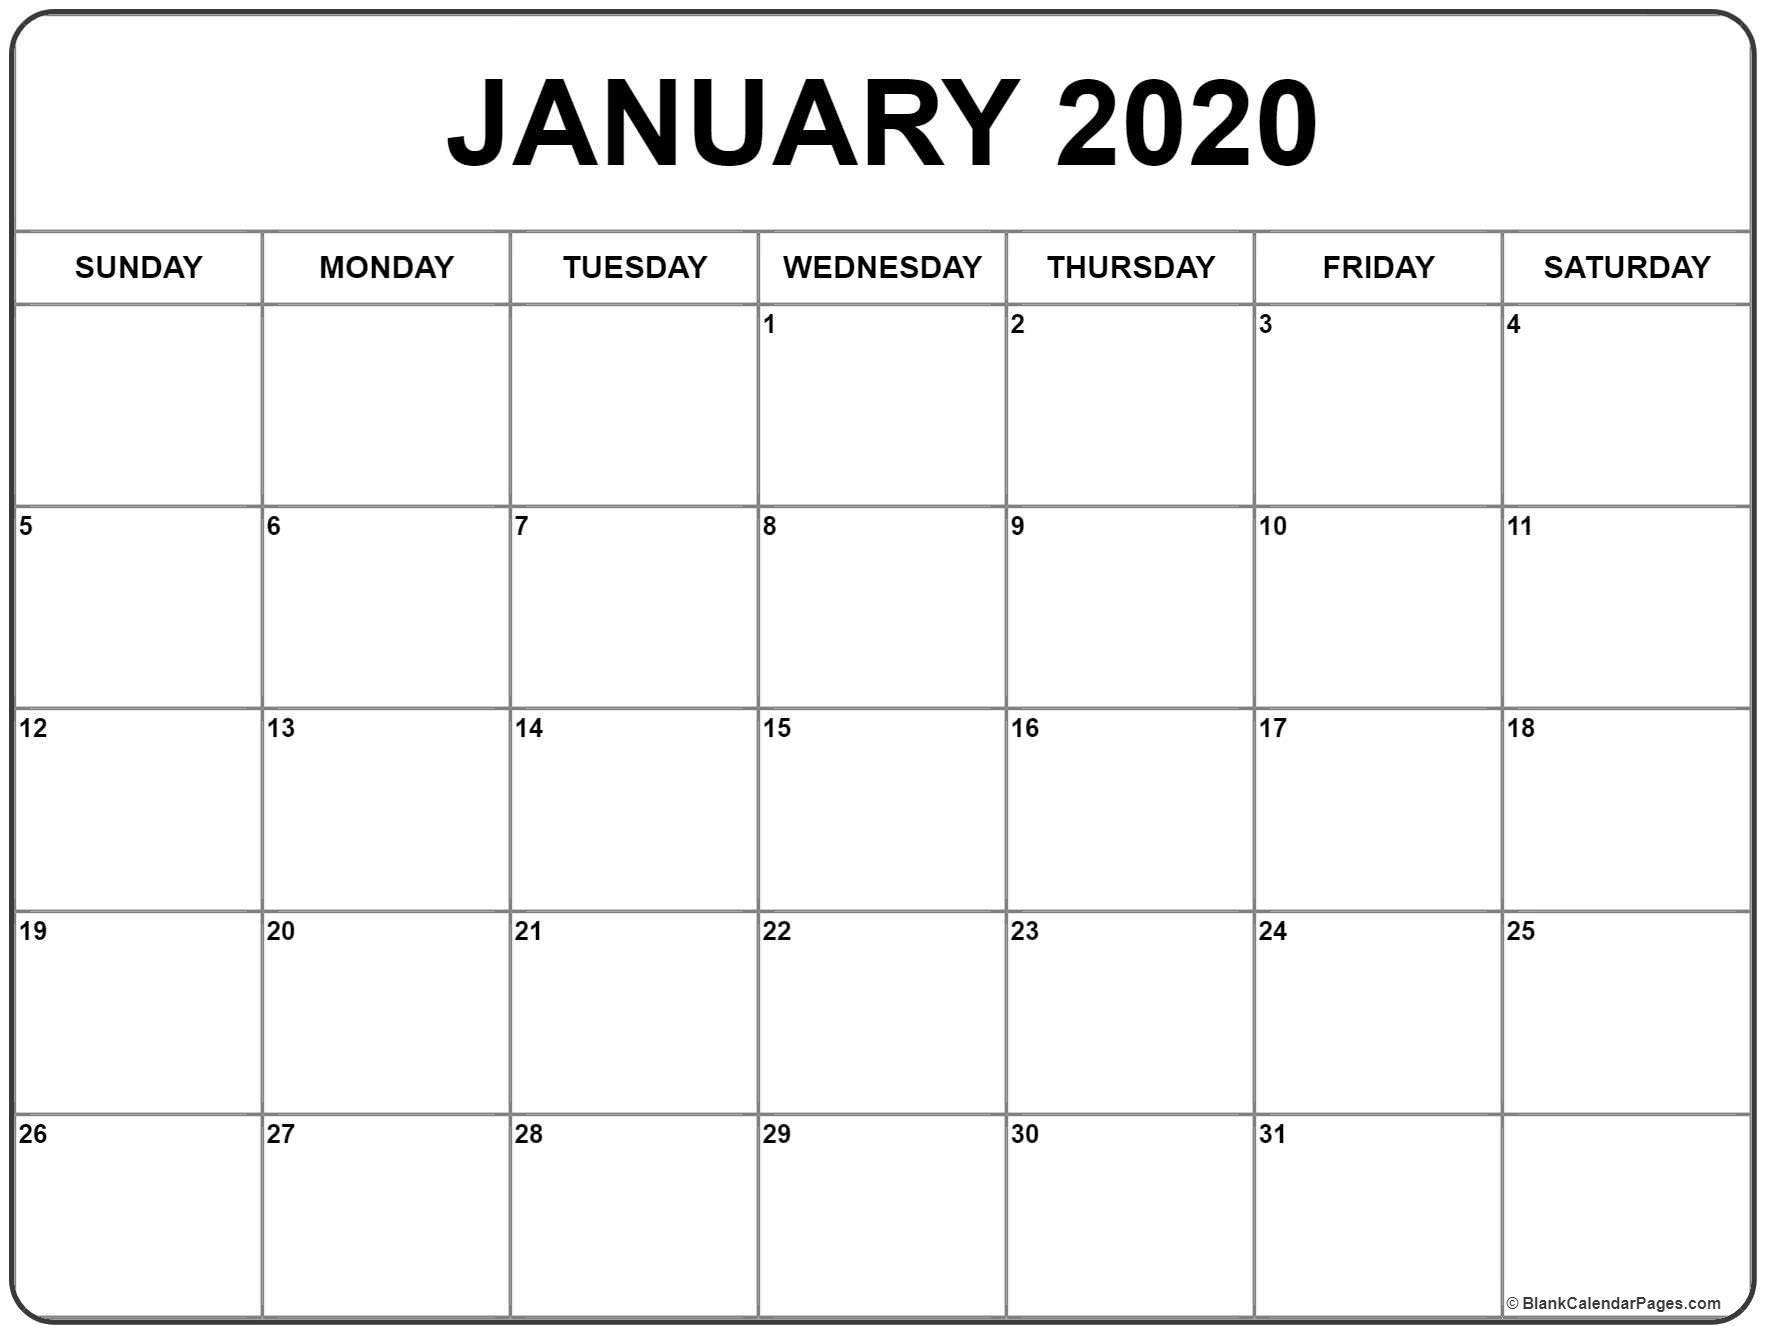 Large Box Printable Calendar 2020 Google - Calendar inside Large Box Calendar 2020 Printable